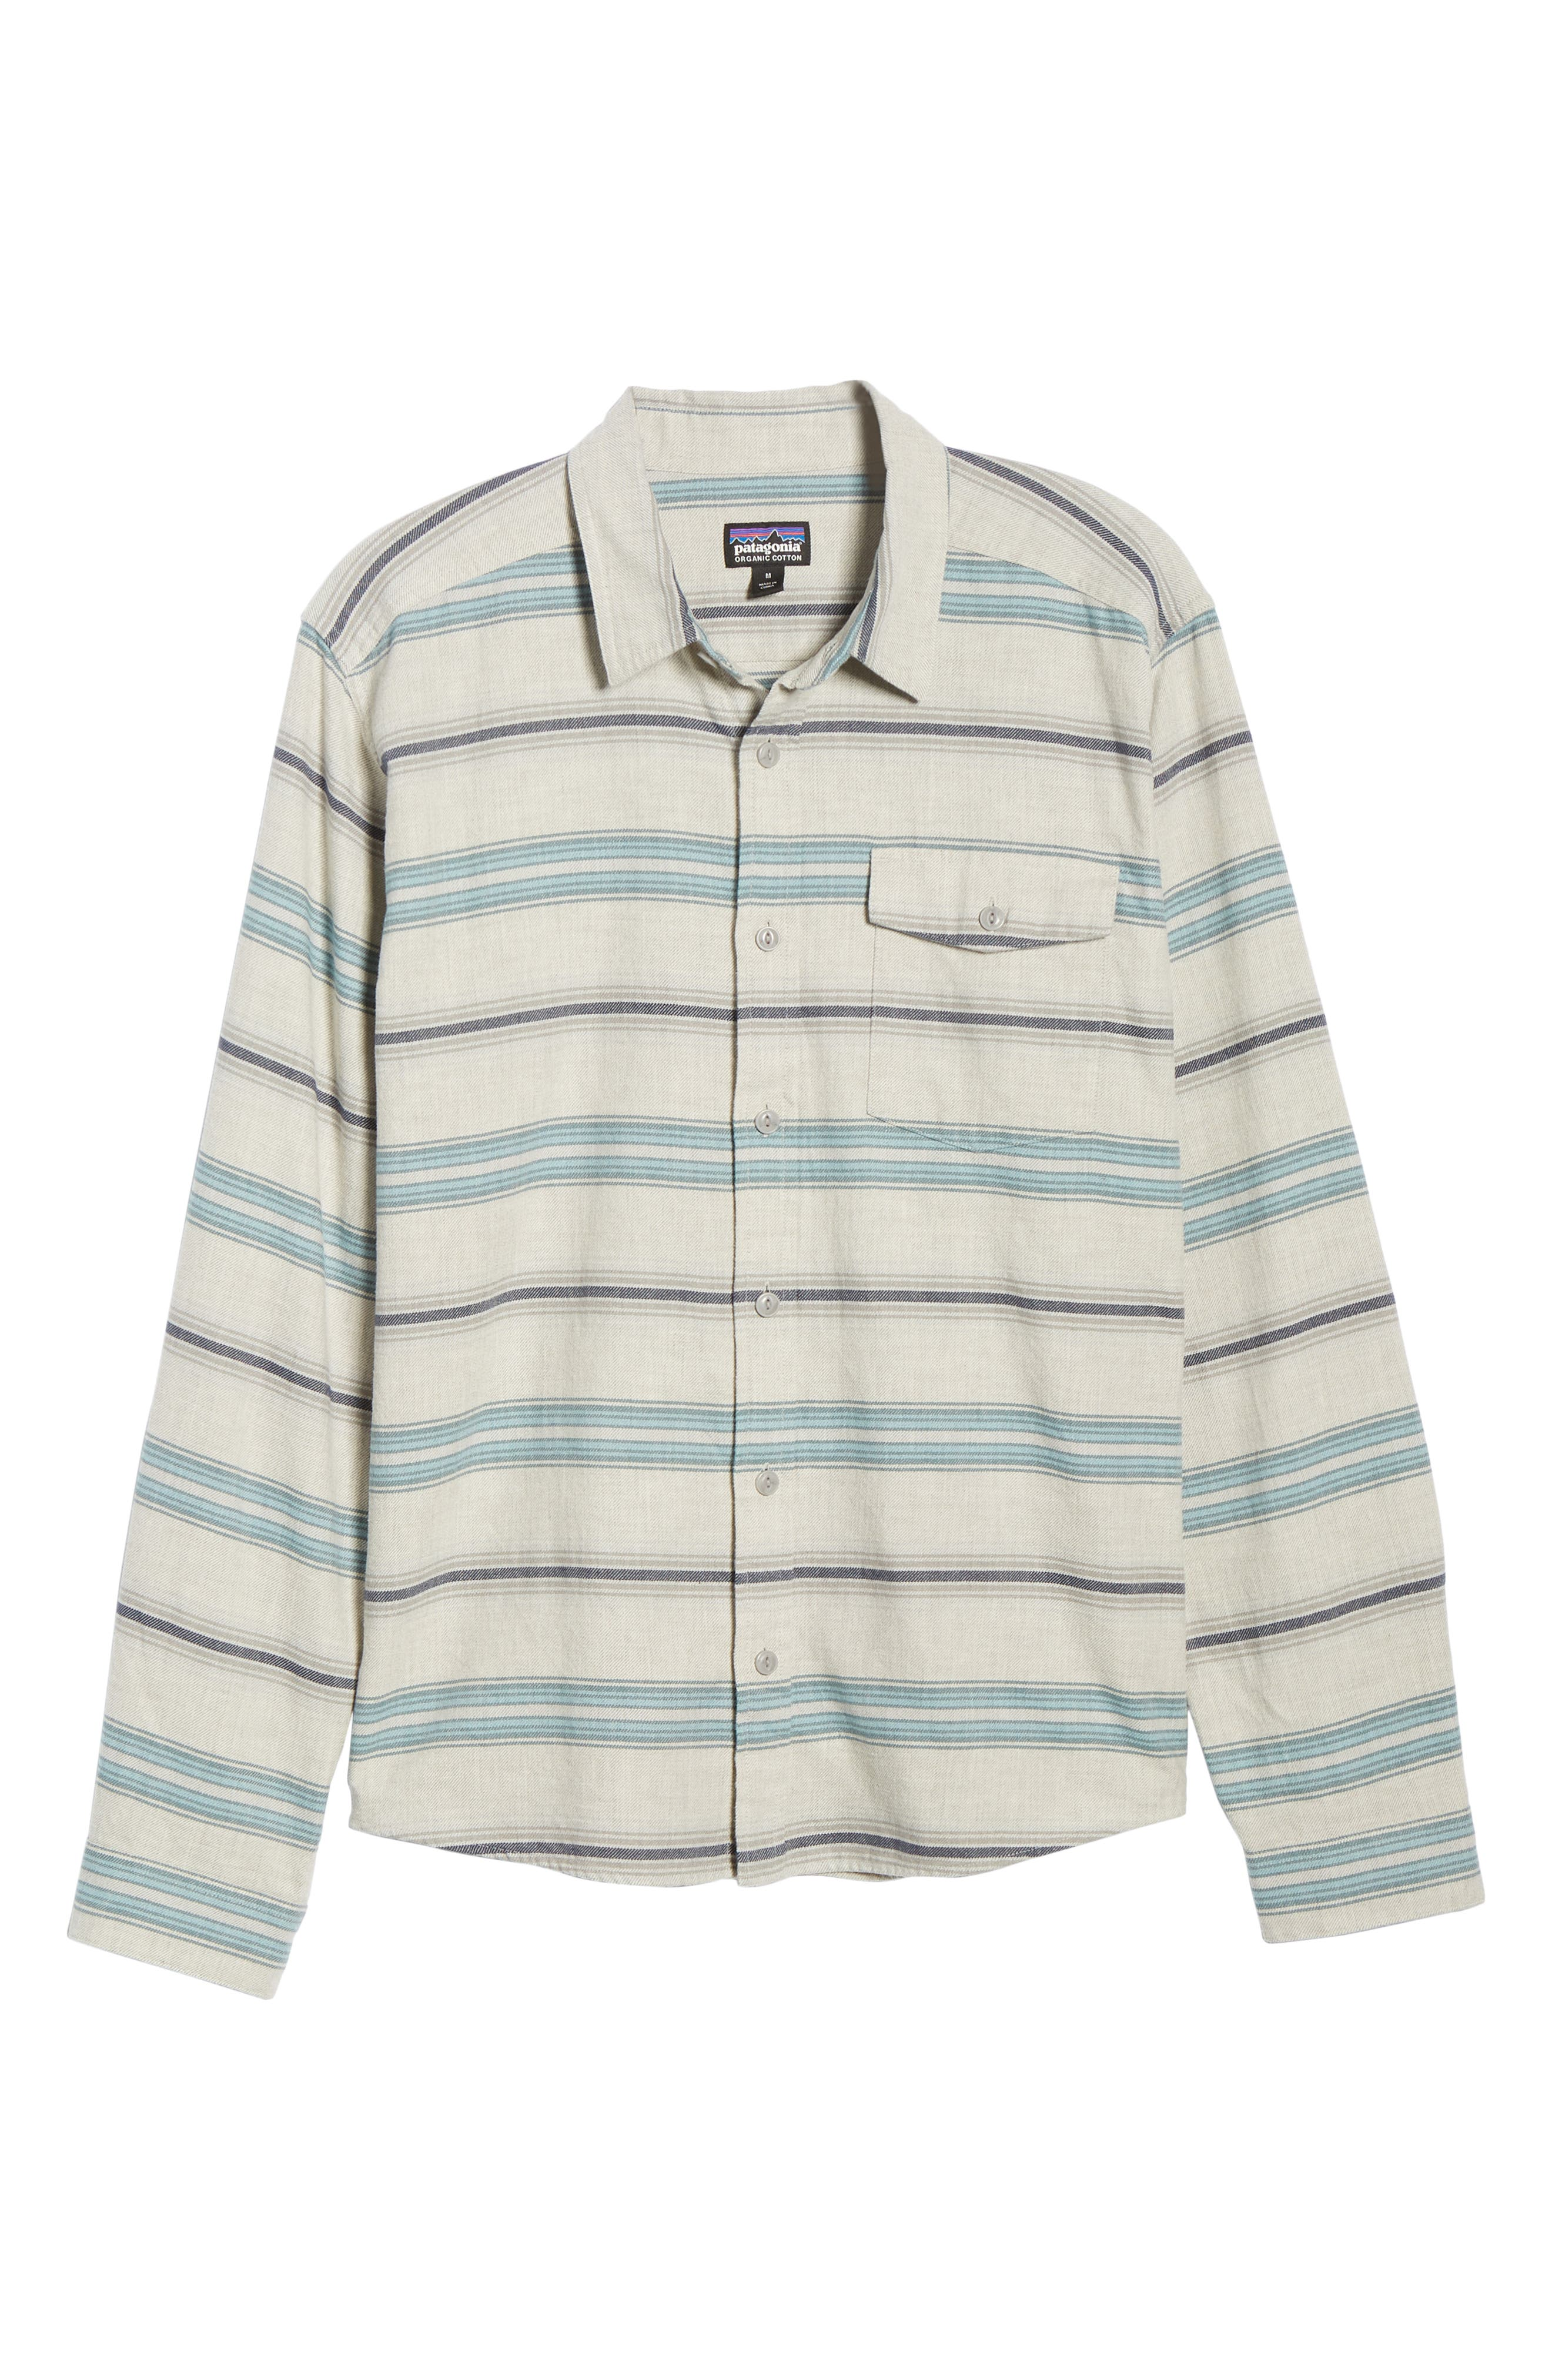 PATAGONIA,                             Regular Fit Organic Cotton Flannel Shirt,                             Alternate thumbnail 5, color,                             TARKINE STRIPE DRIFTER GREY